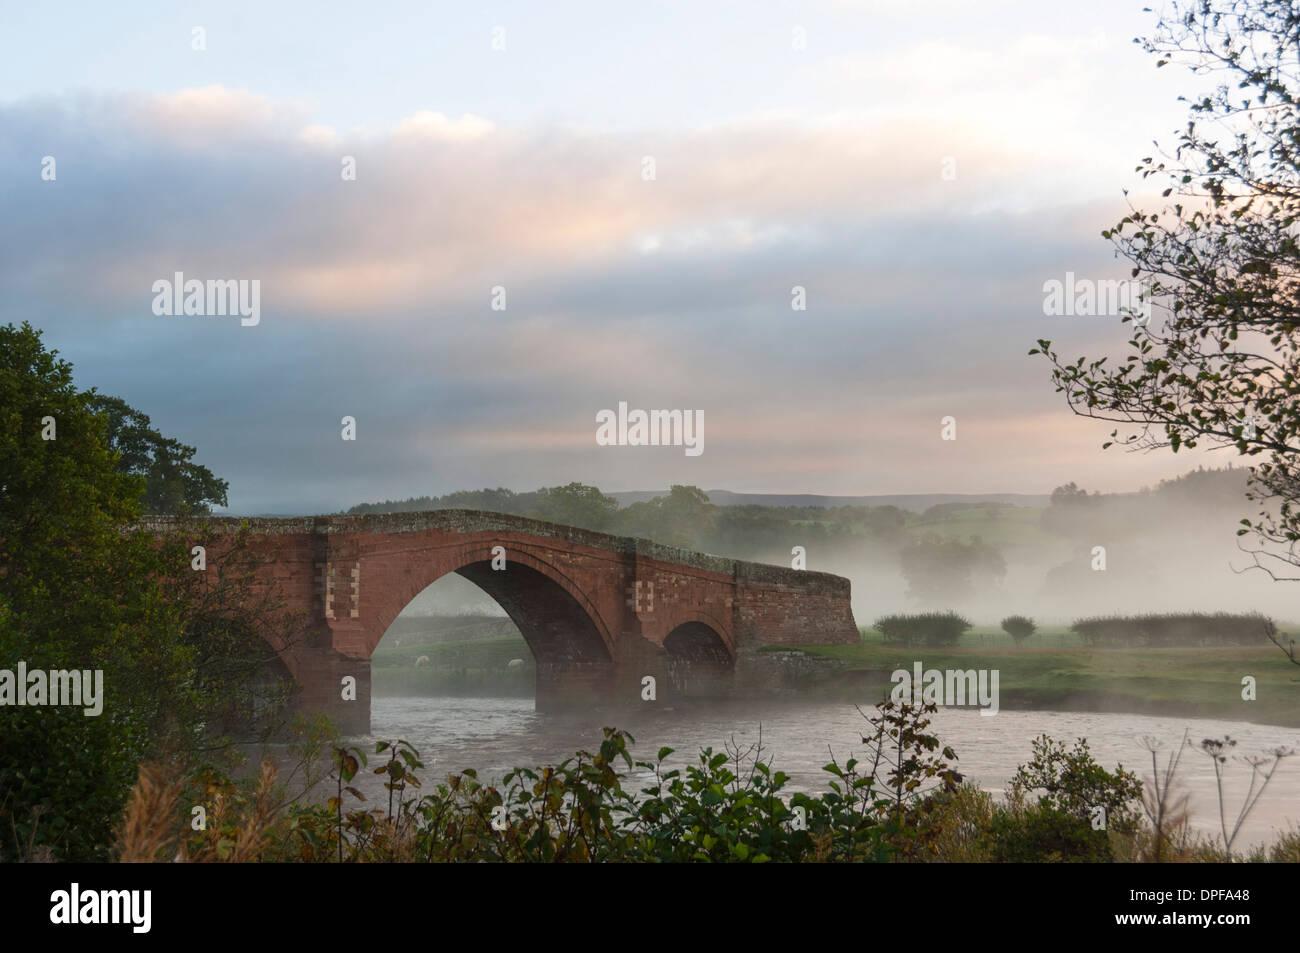 Autumn, early morning, Eden Bridge, Lazonby, Eden Valley, Cumbria, England, United Kingdom, Europe - Stock Image